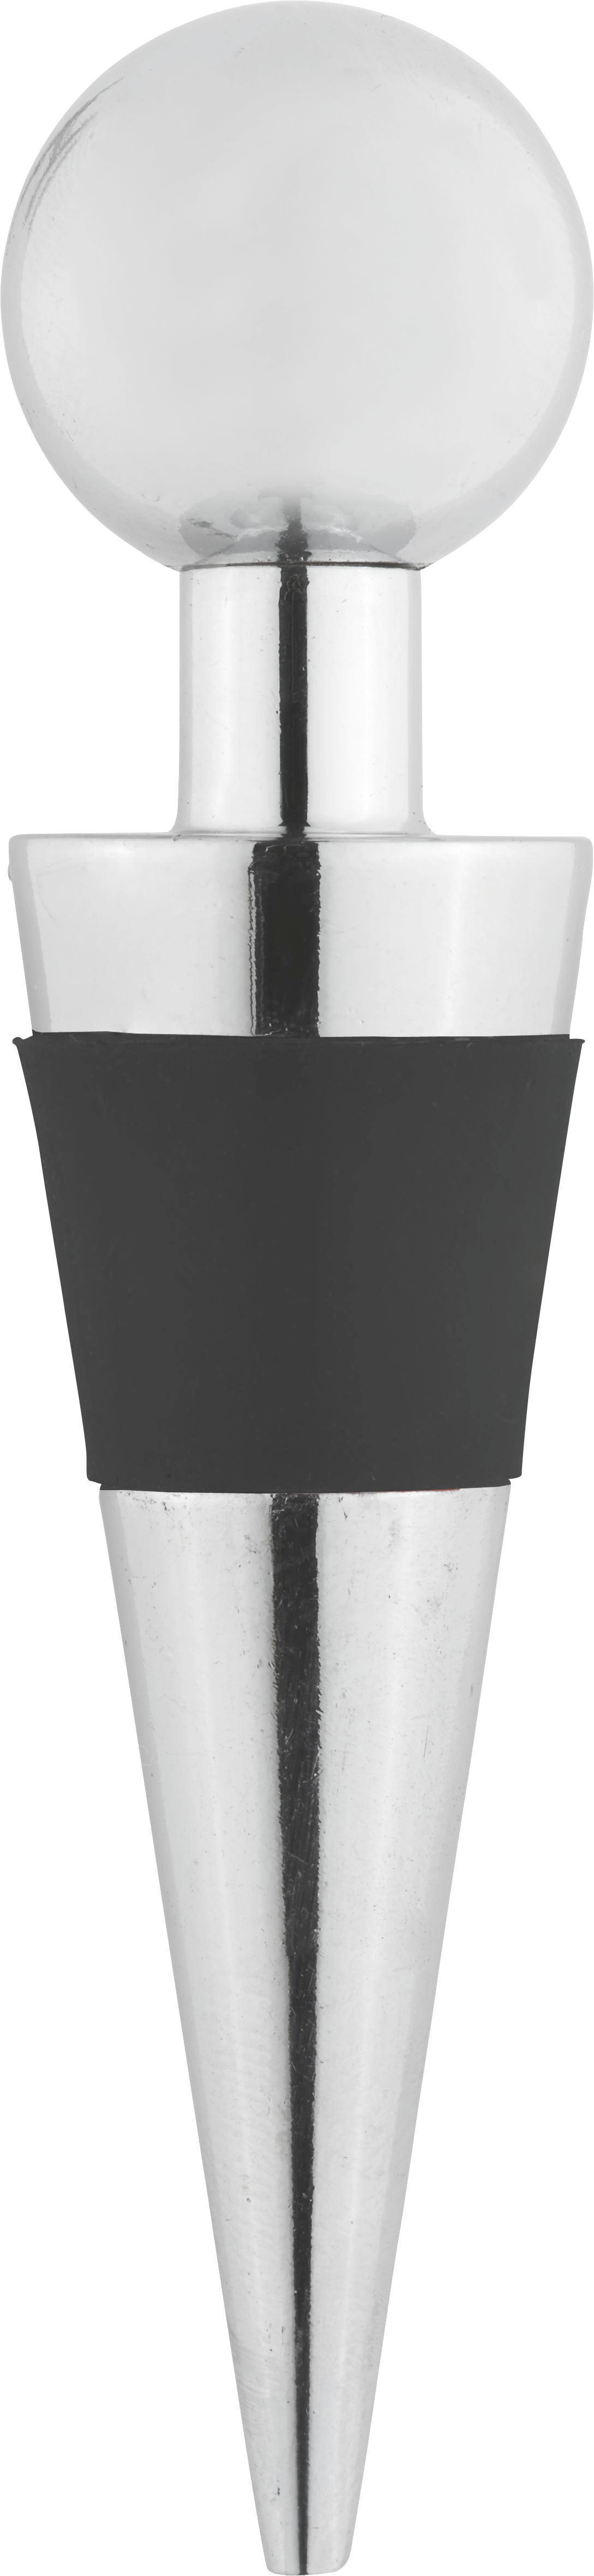 Flaschenverschluss Sibile - Silberfarben, Metall (0.8kg) - MÖMAX modern living